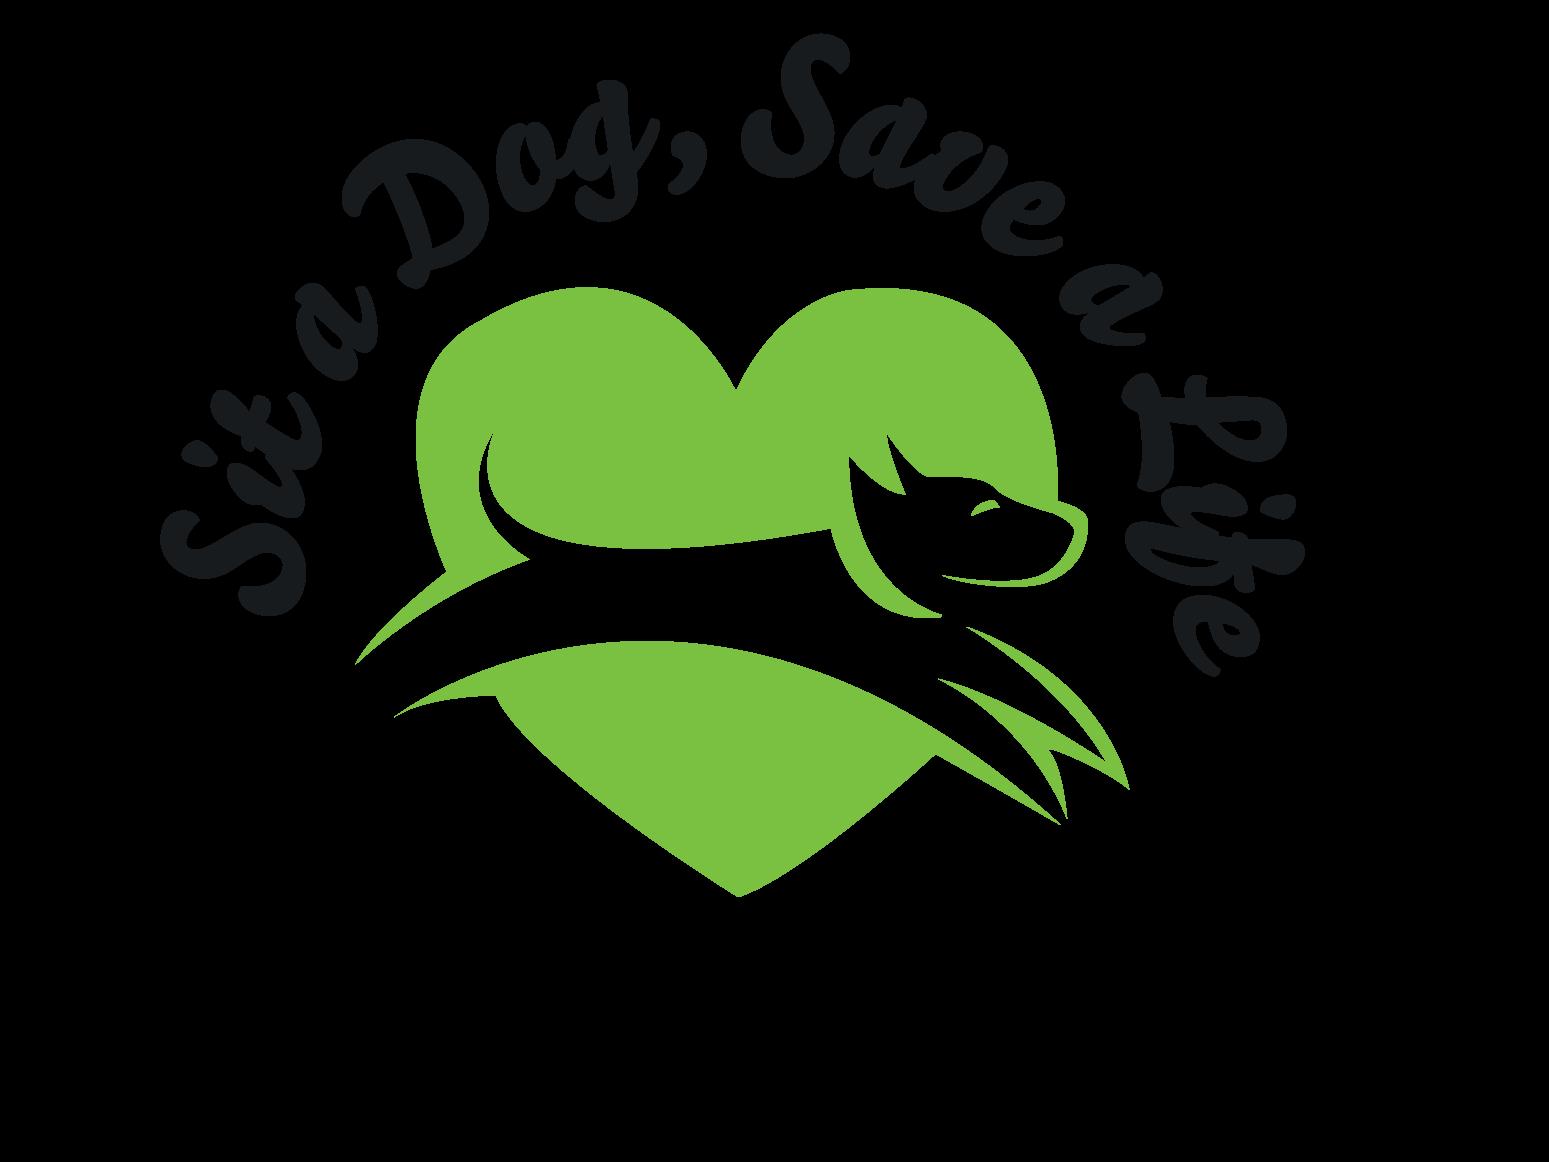 Sit a Dog, Save a Life